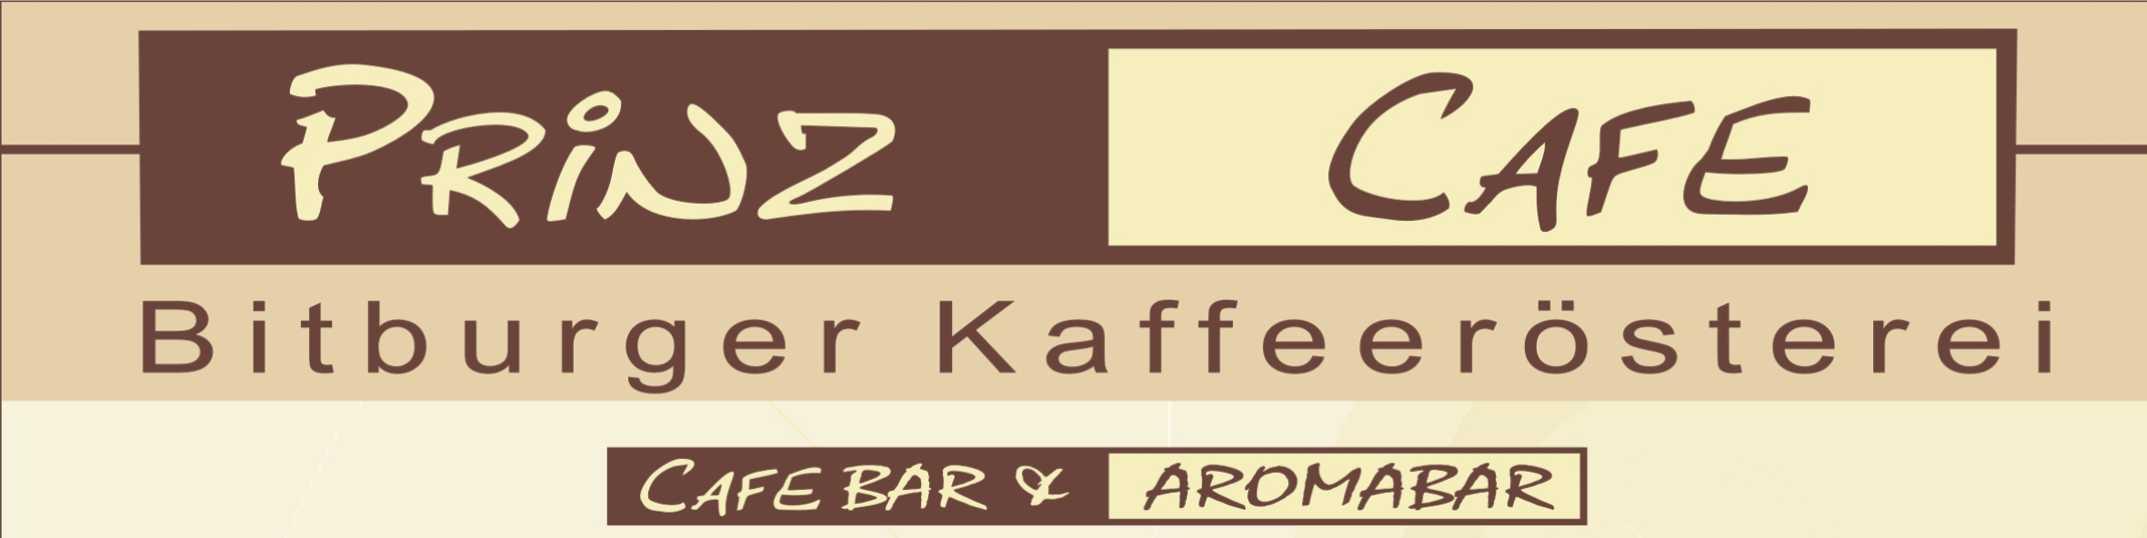 Prinz Café & Aroma Bar und Kaffeerösterei in Bitburg